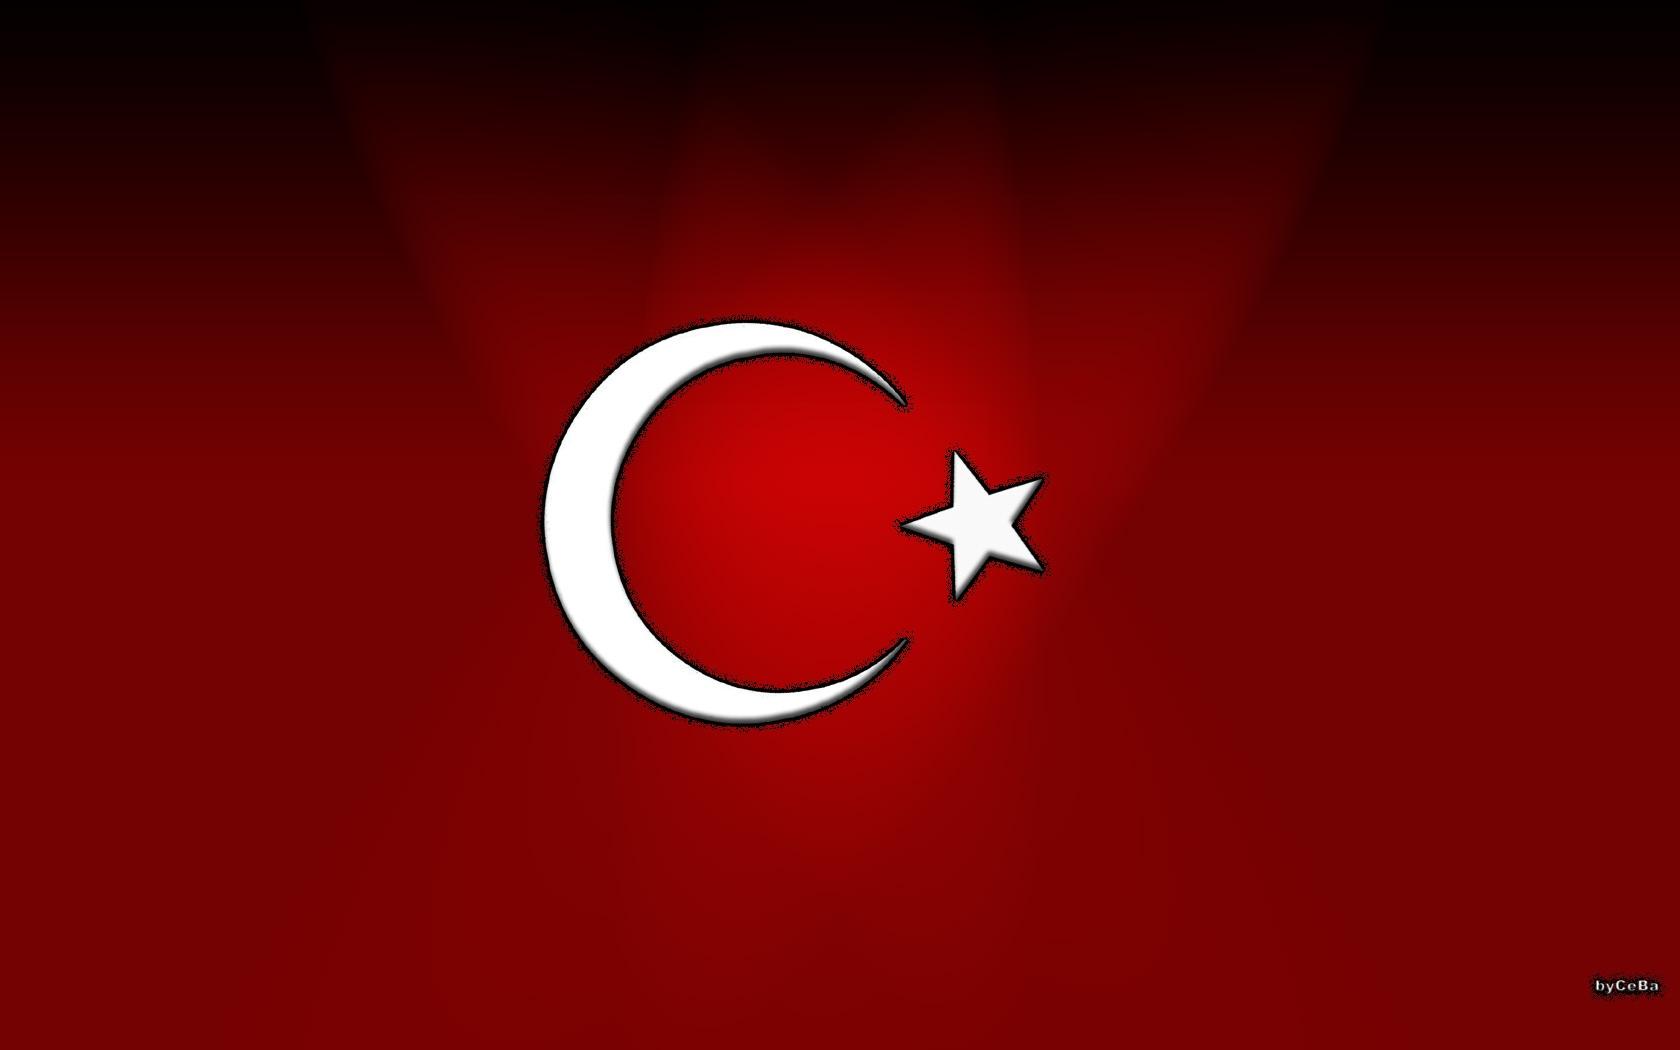 Sfondi Bianca Rosso Cielo Logo Bandiera Cerchio Luna